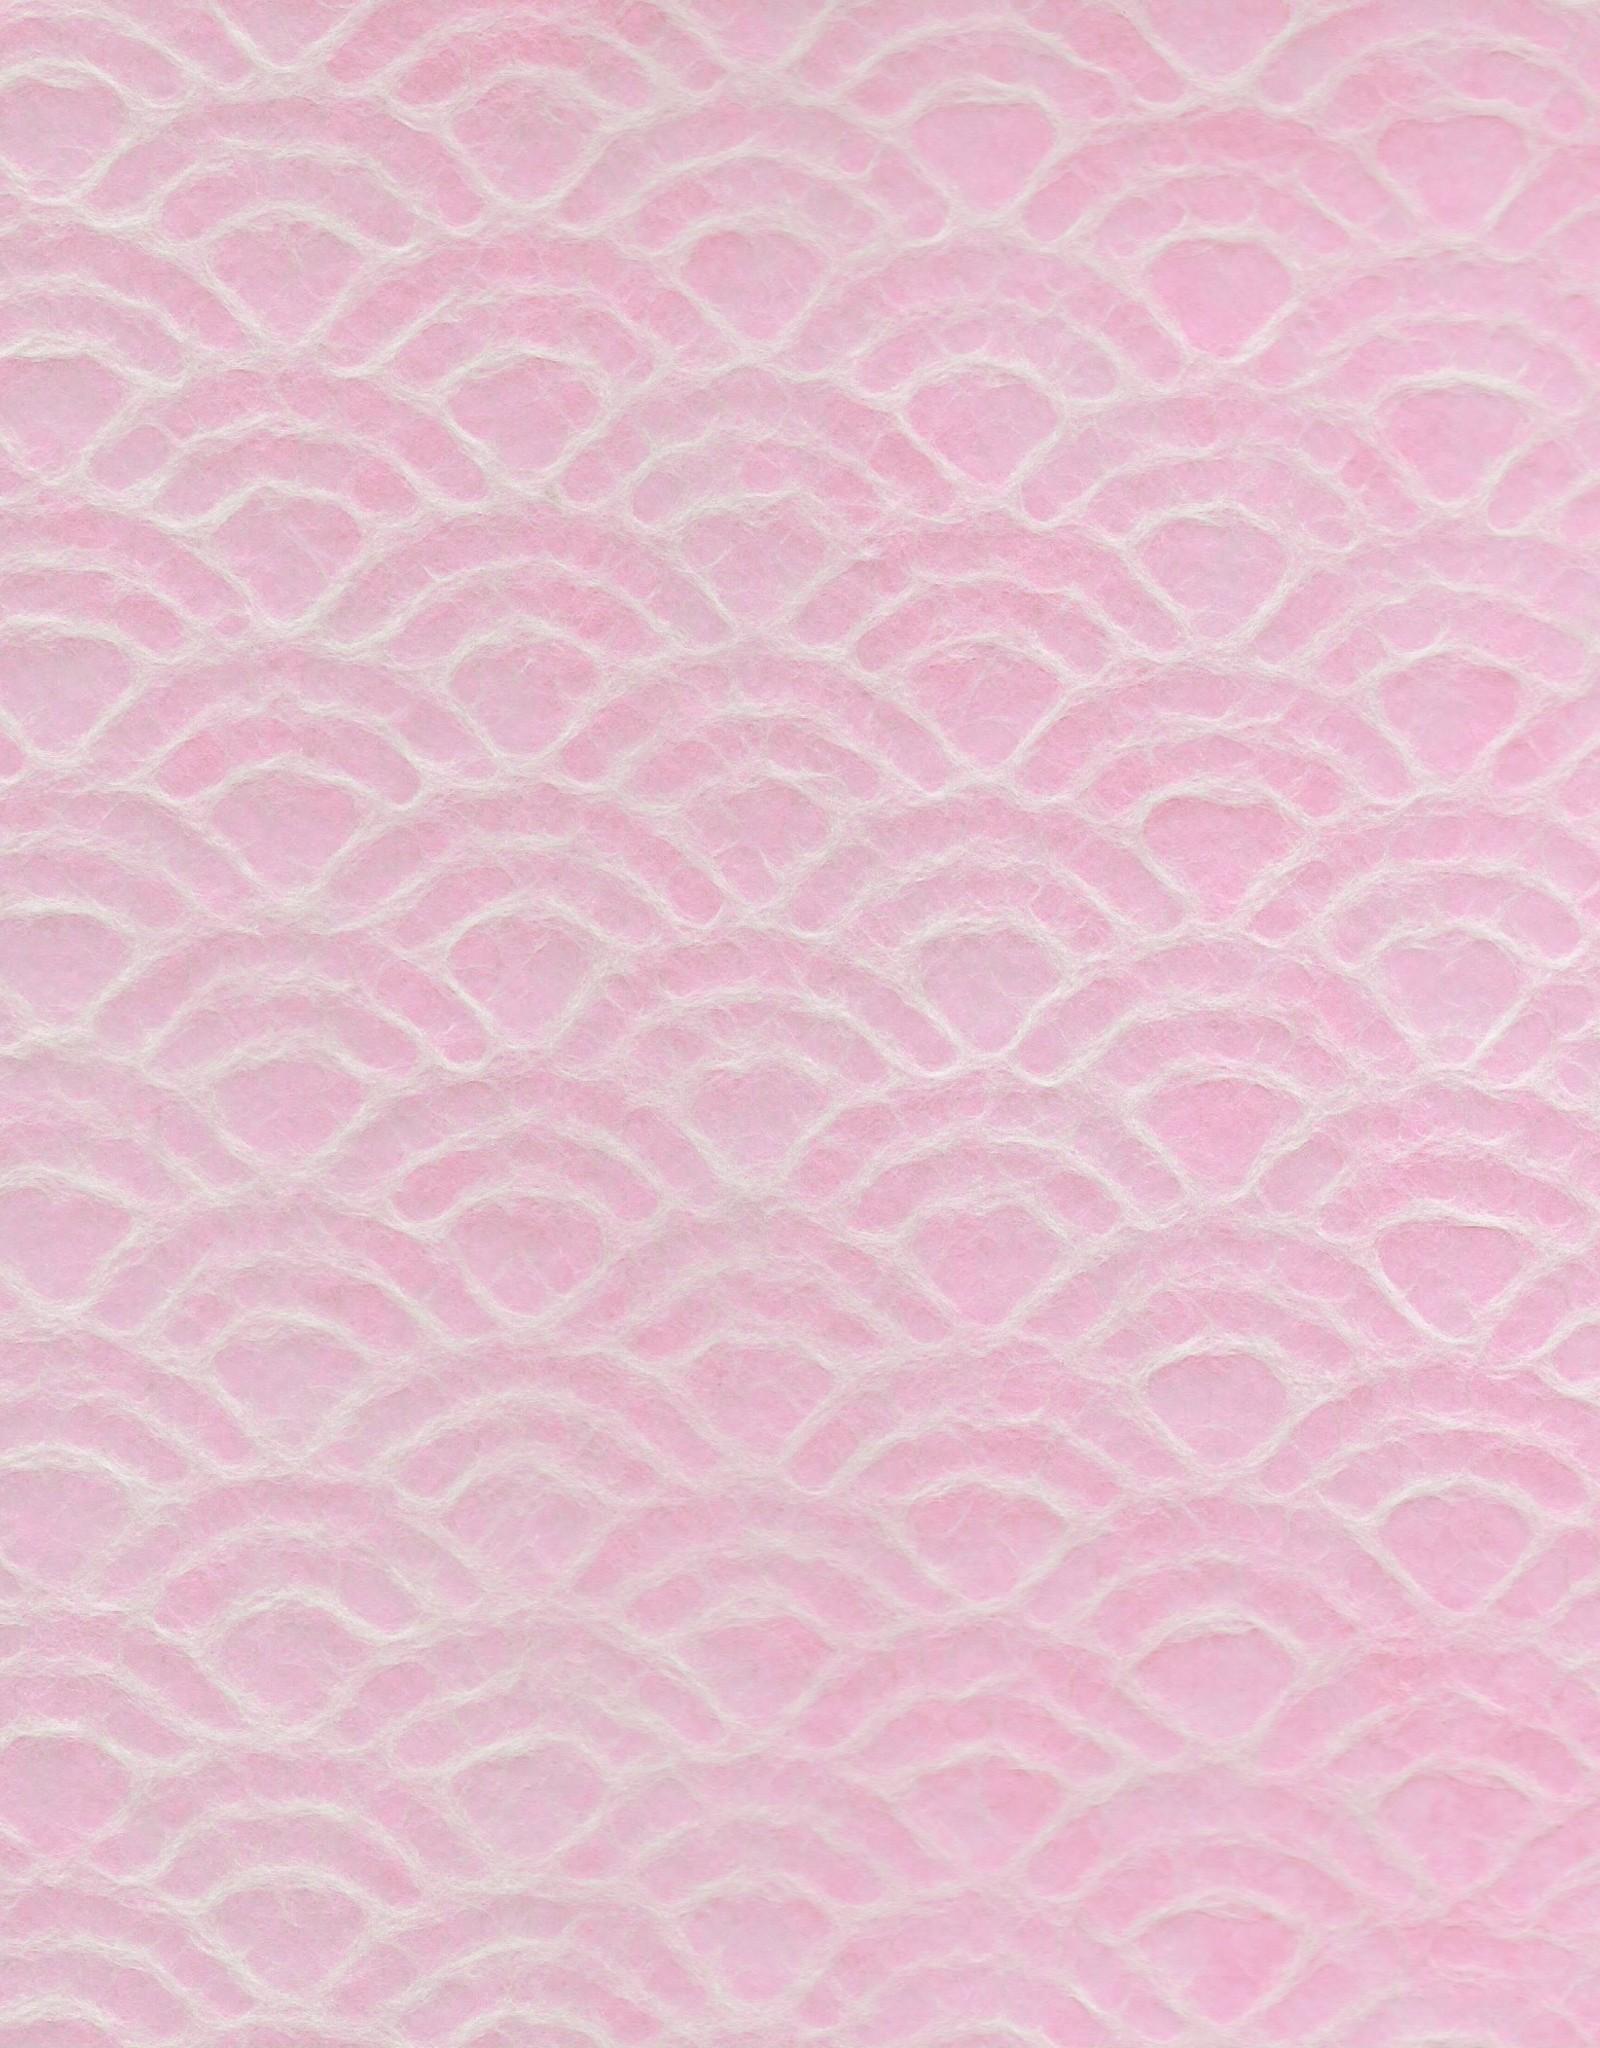 "Japanese Uminami Lace Pink, 21"" x 31"""